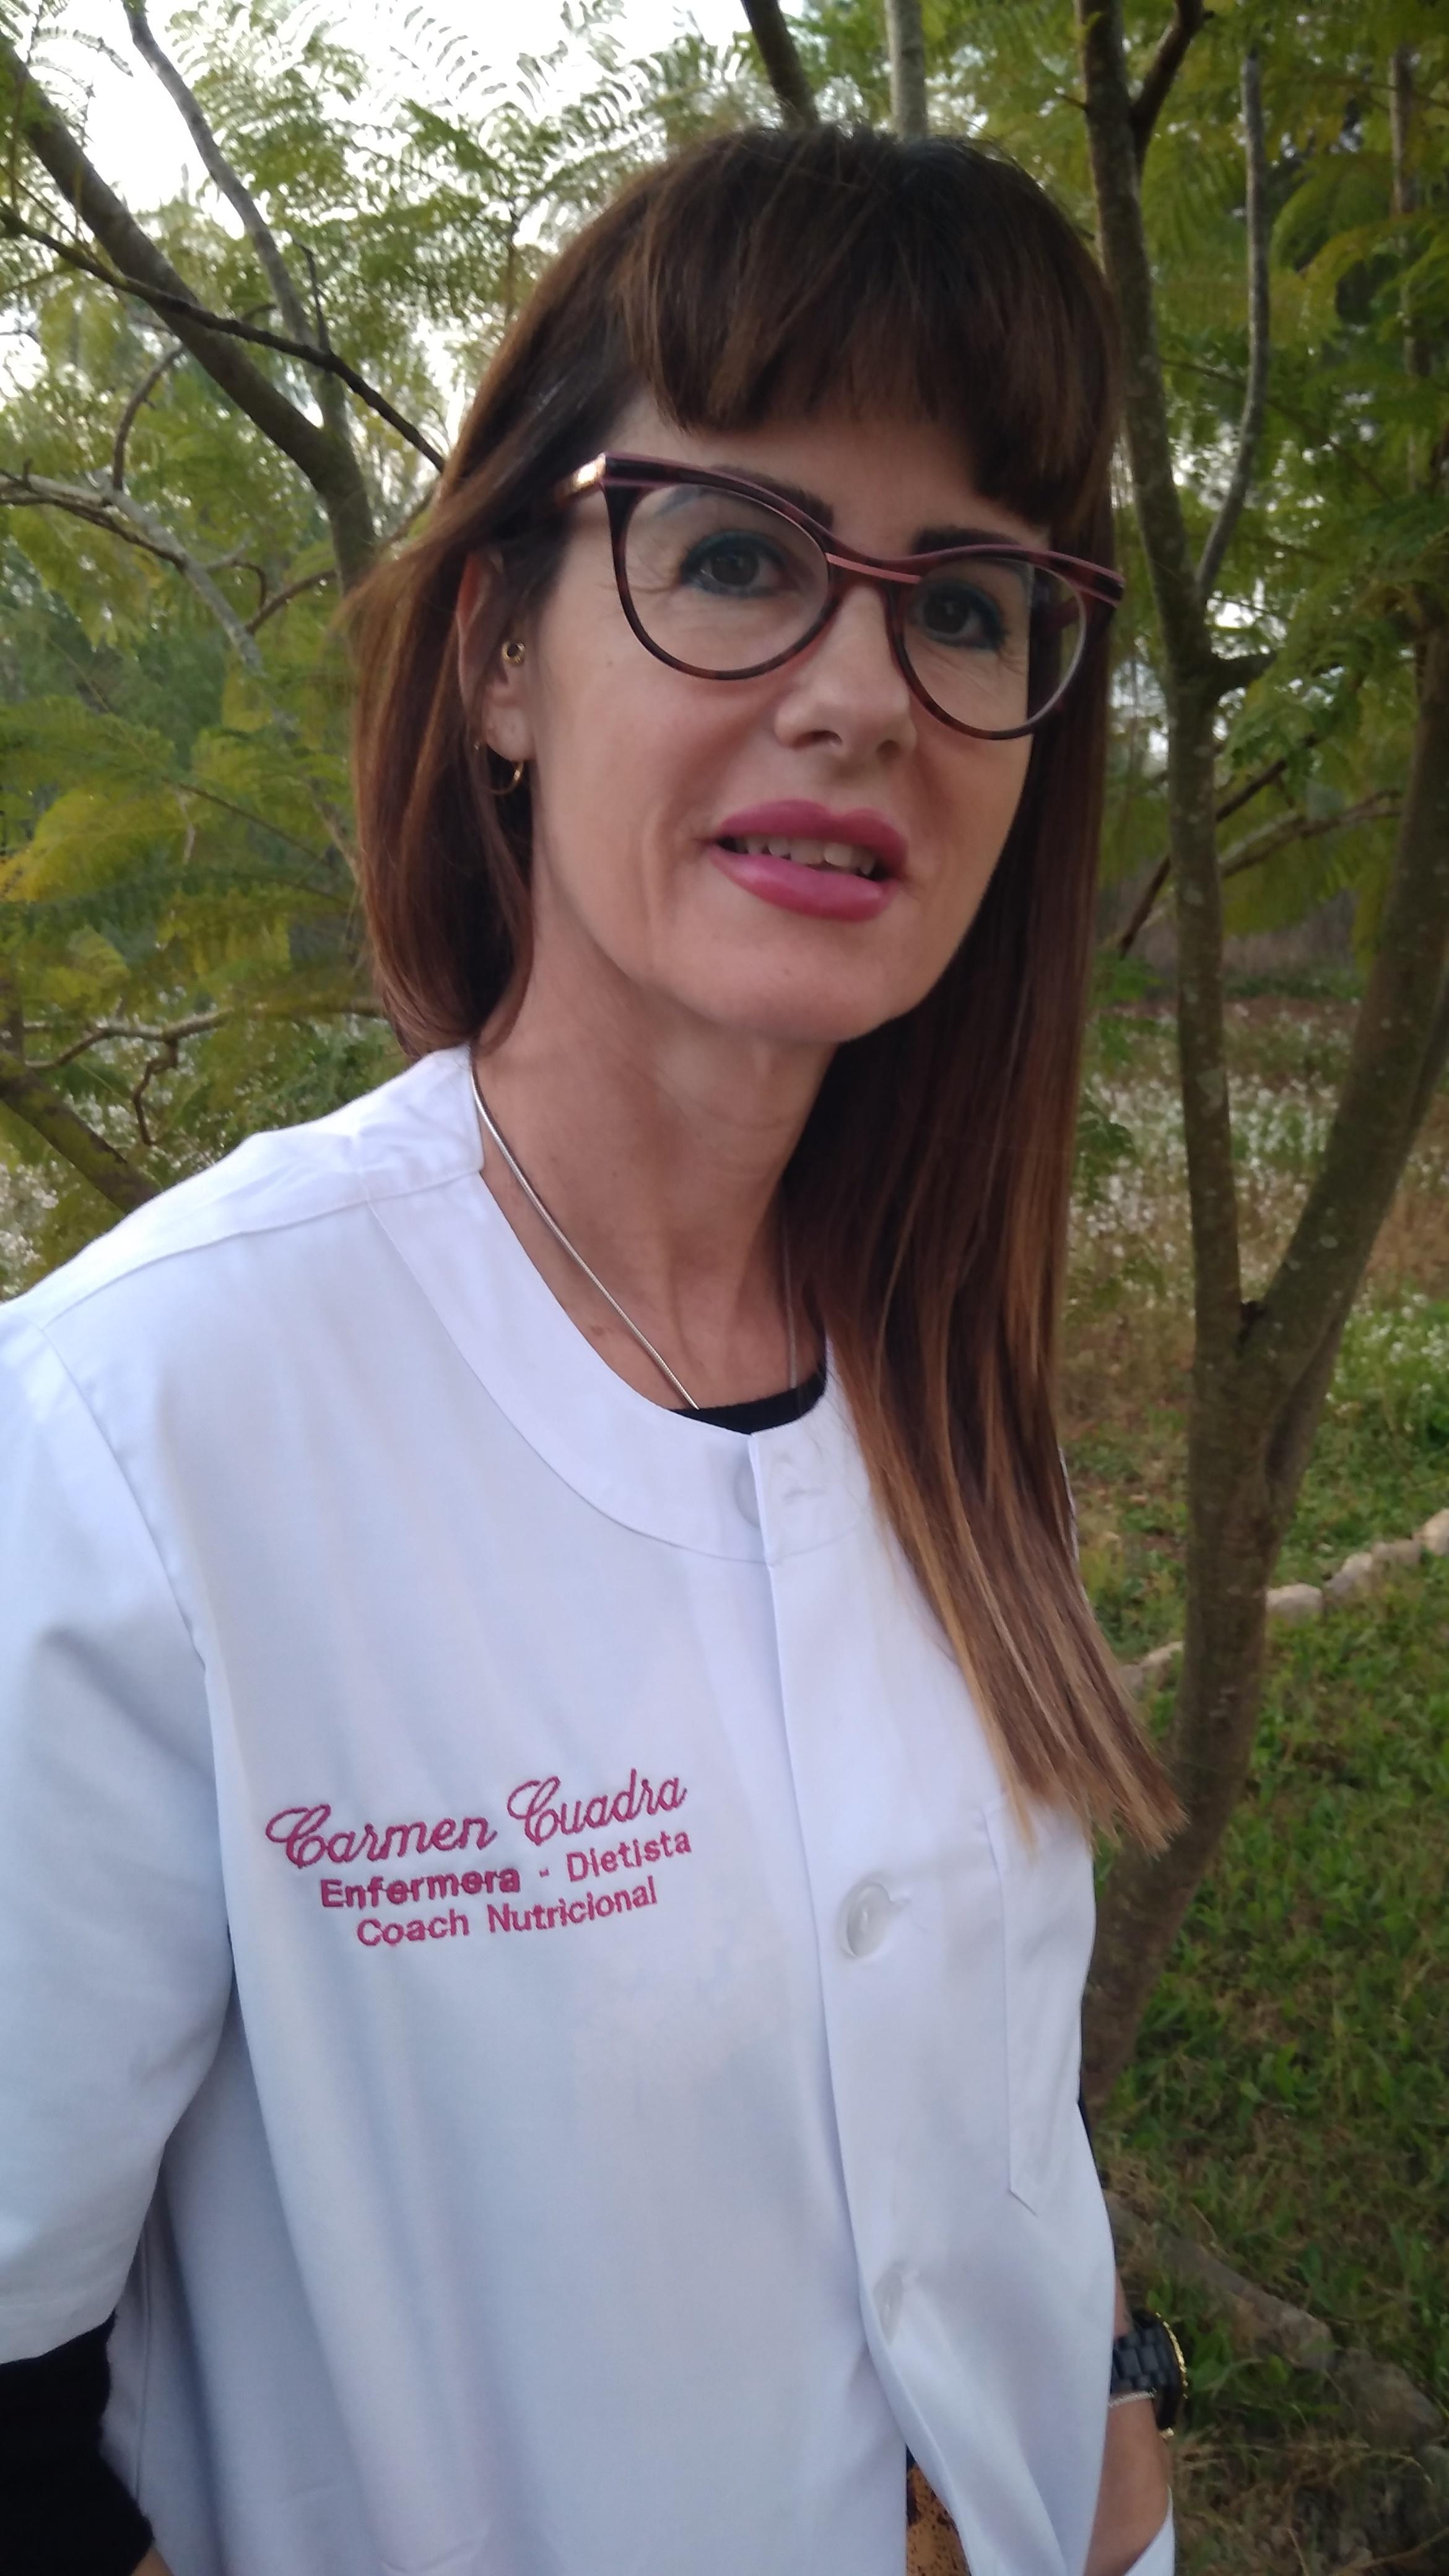 Carmen Cuadra García